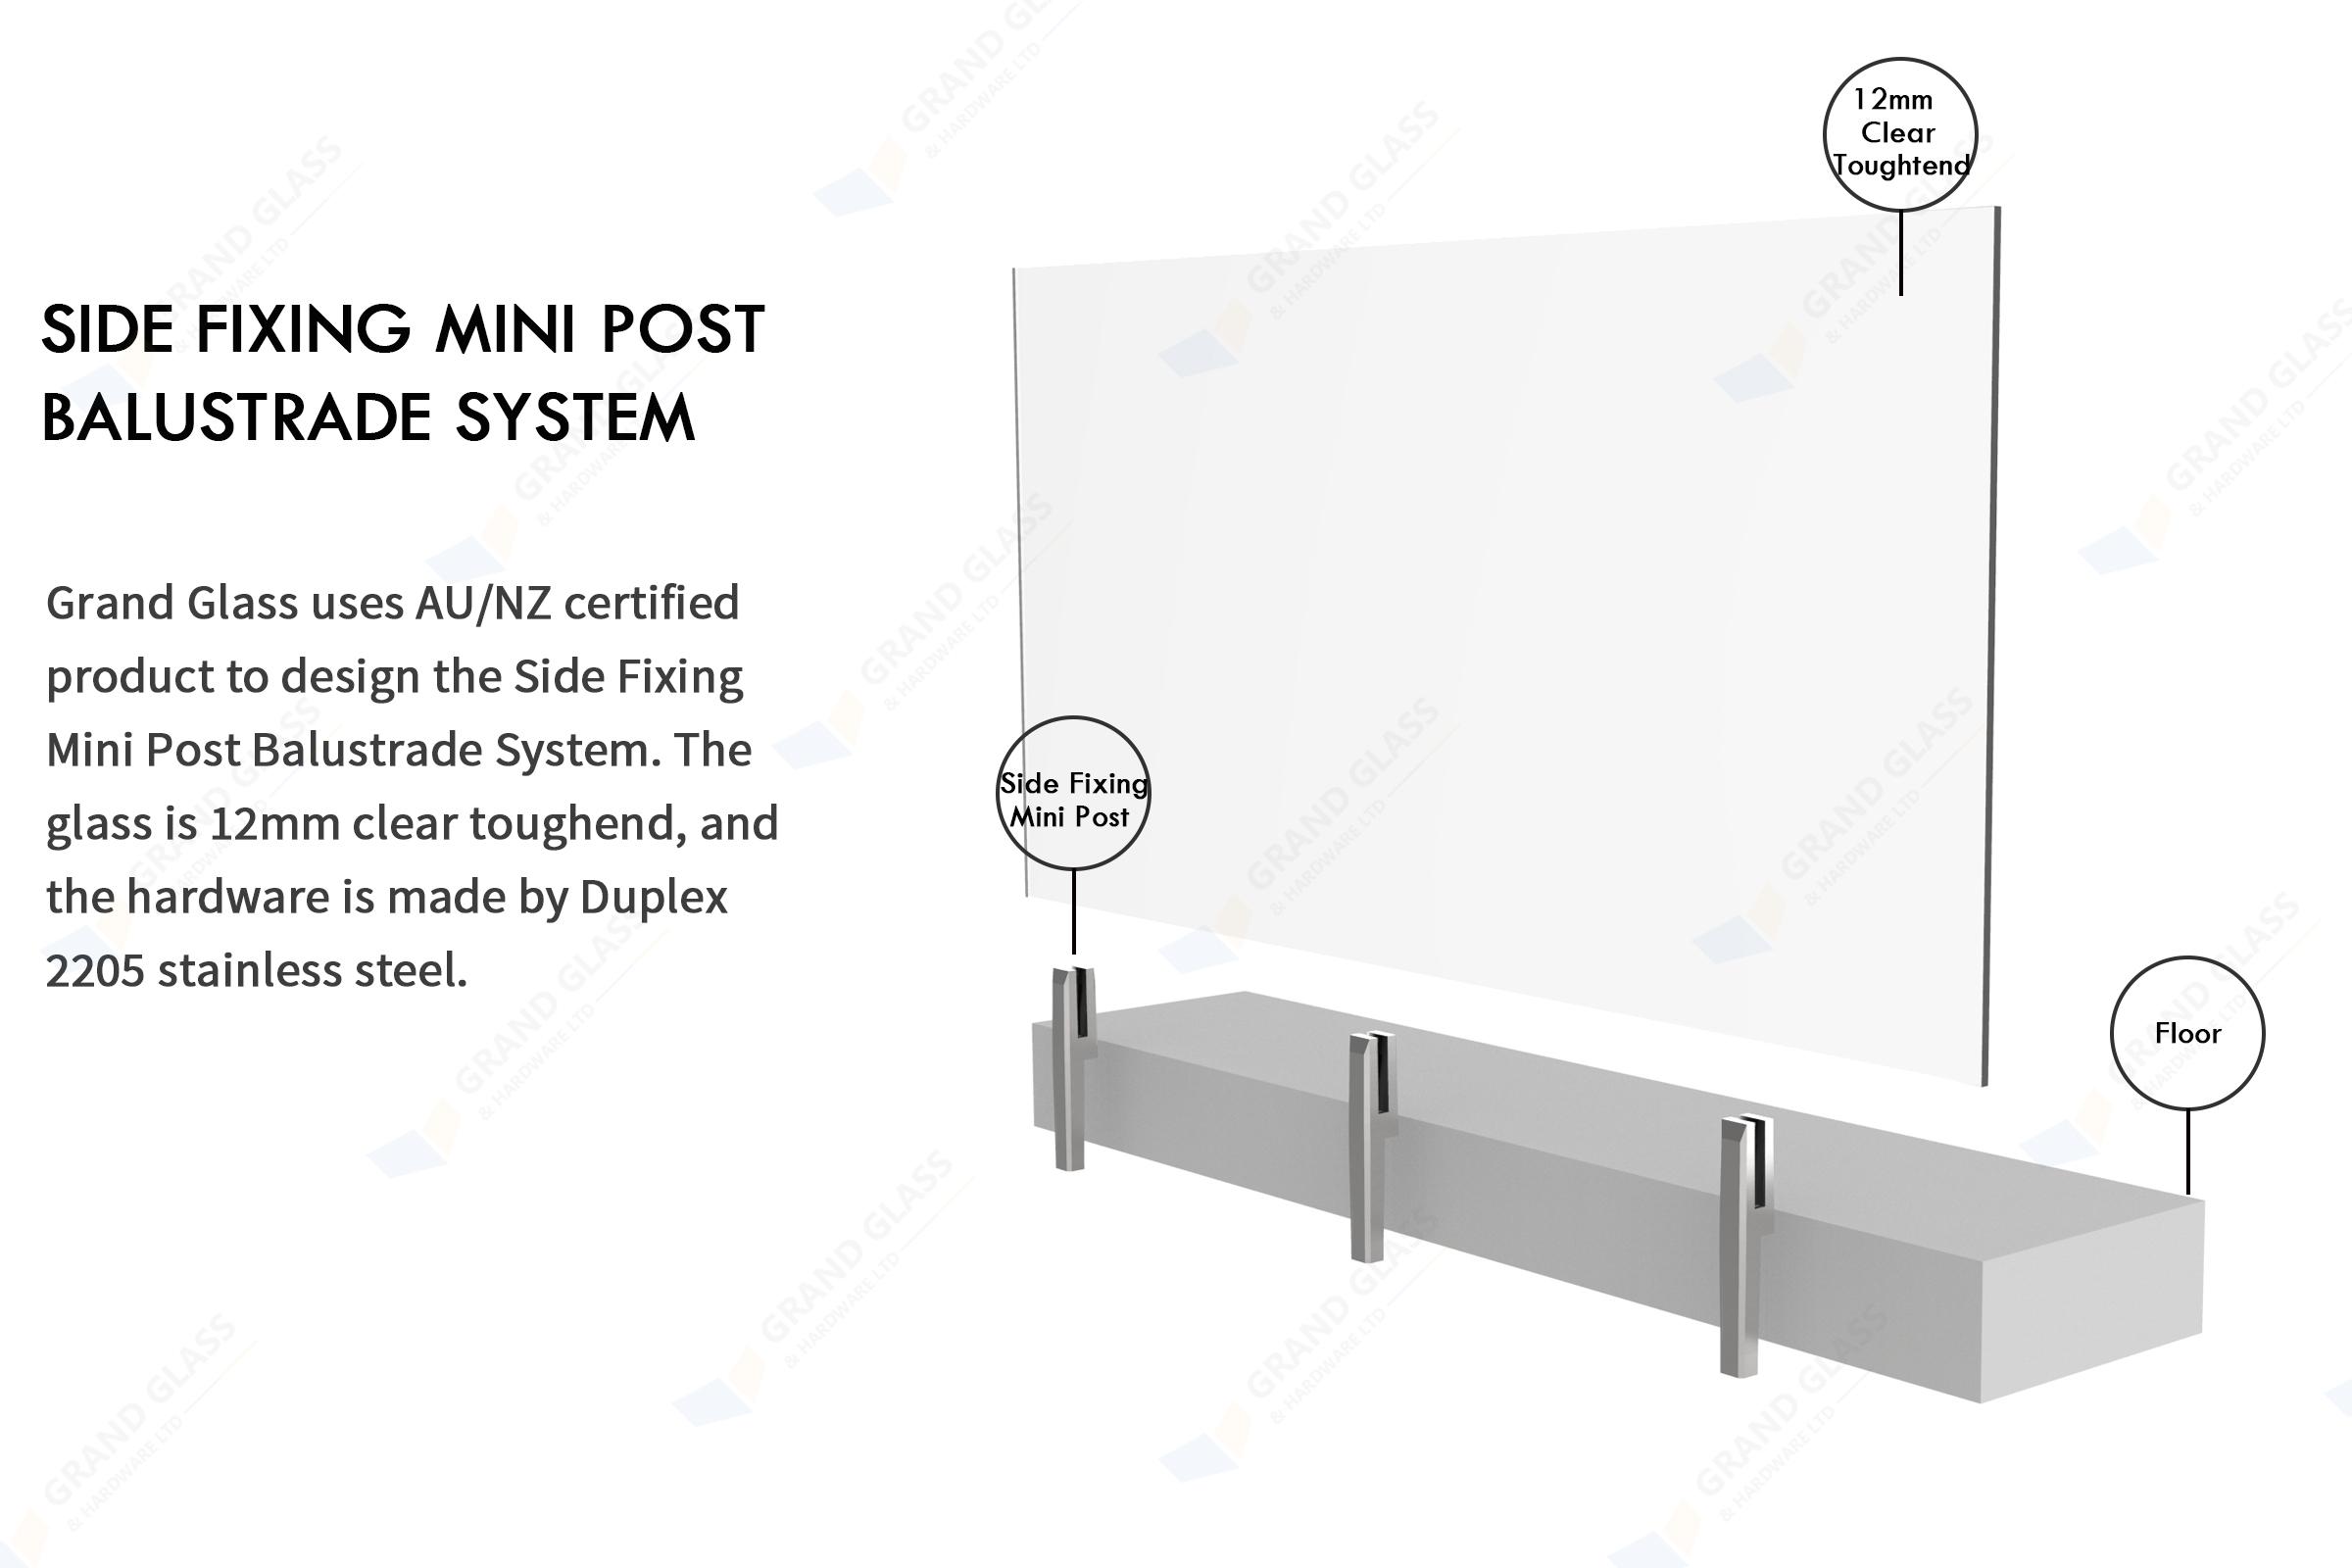 sf-mini-post-balustrade-fence.jpg